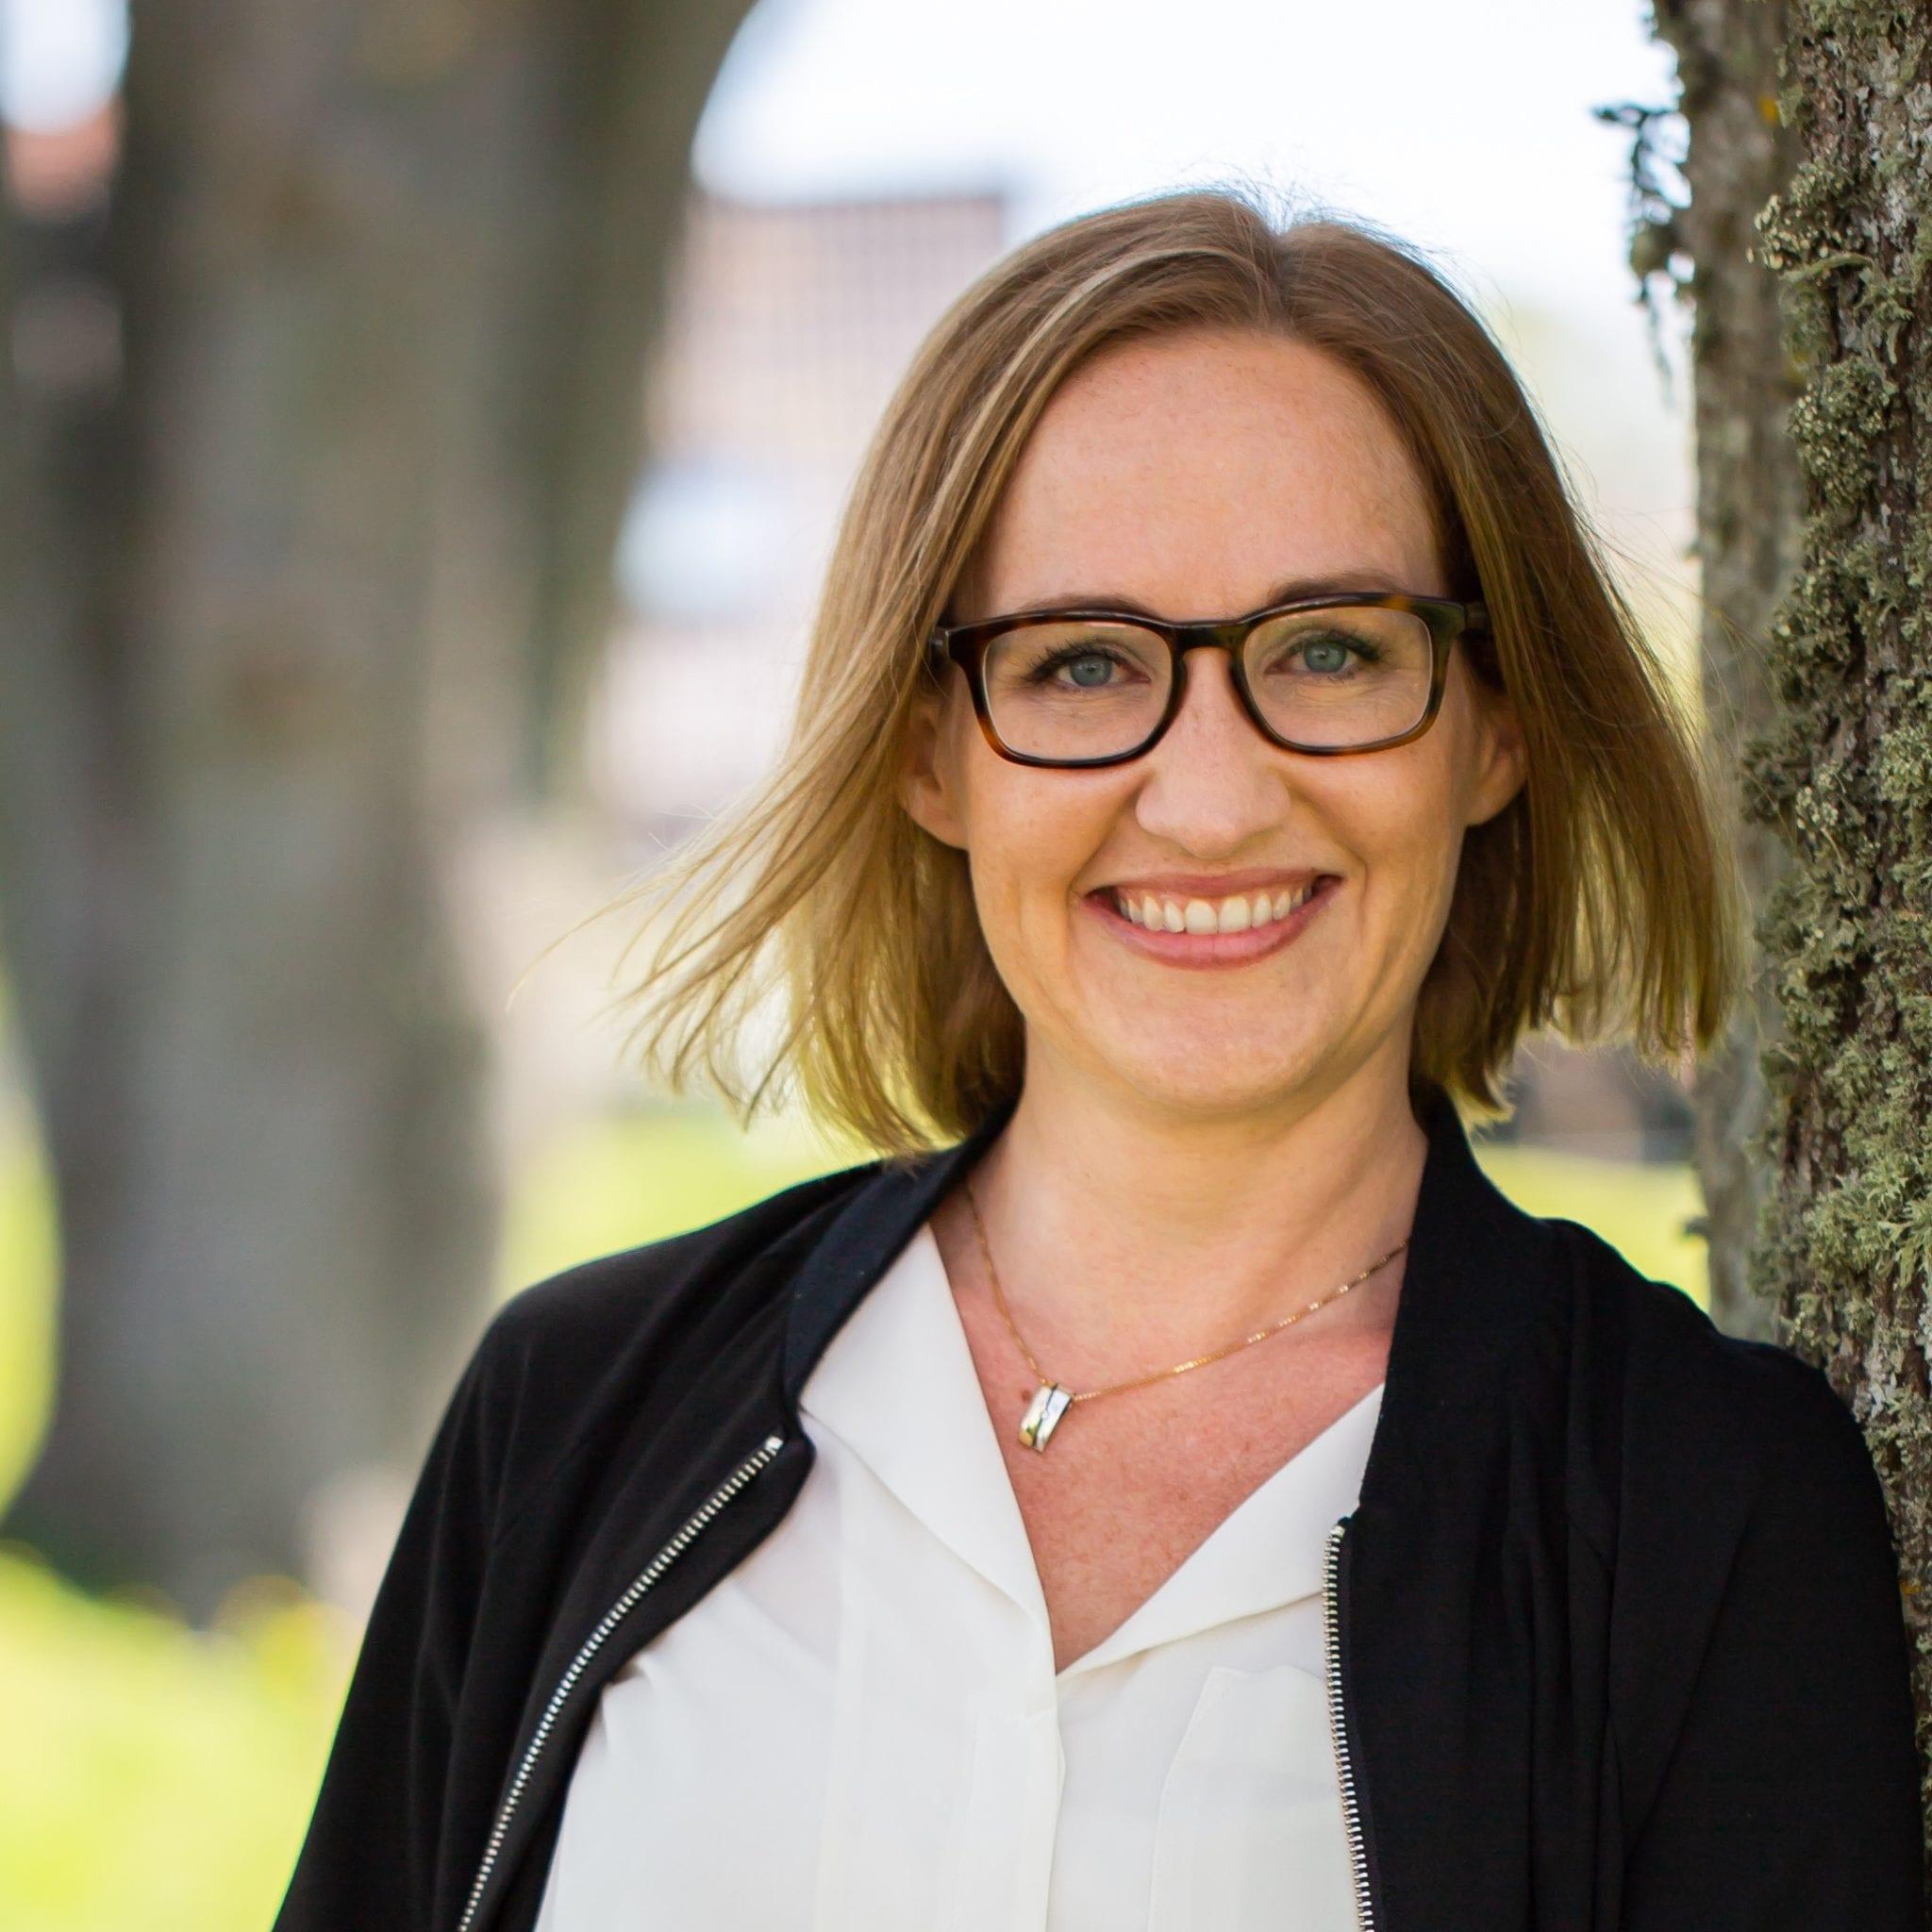 Malin Emilsson - Kraft & Balans i Skövde